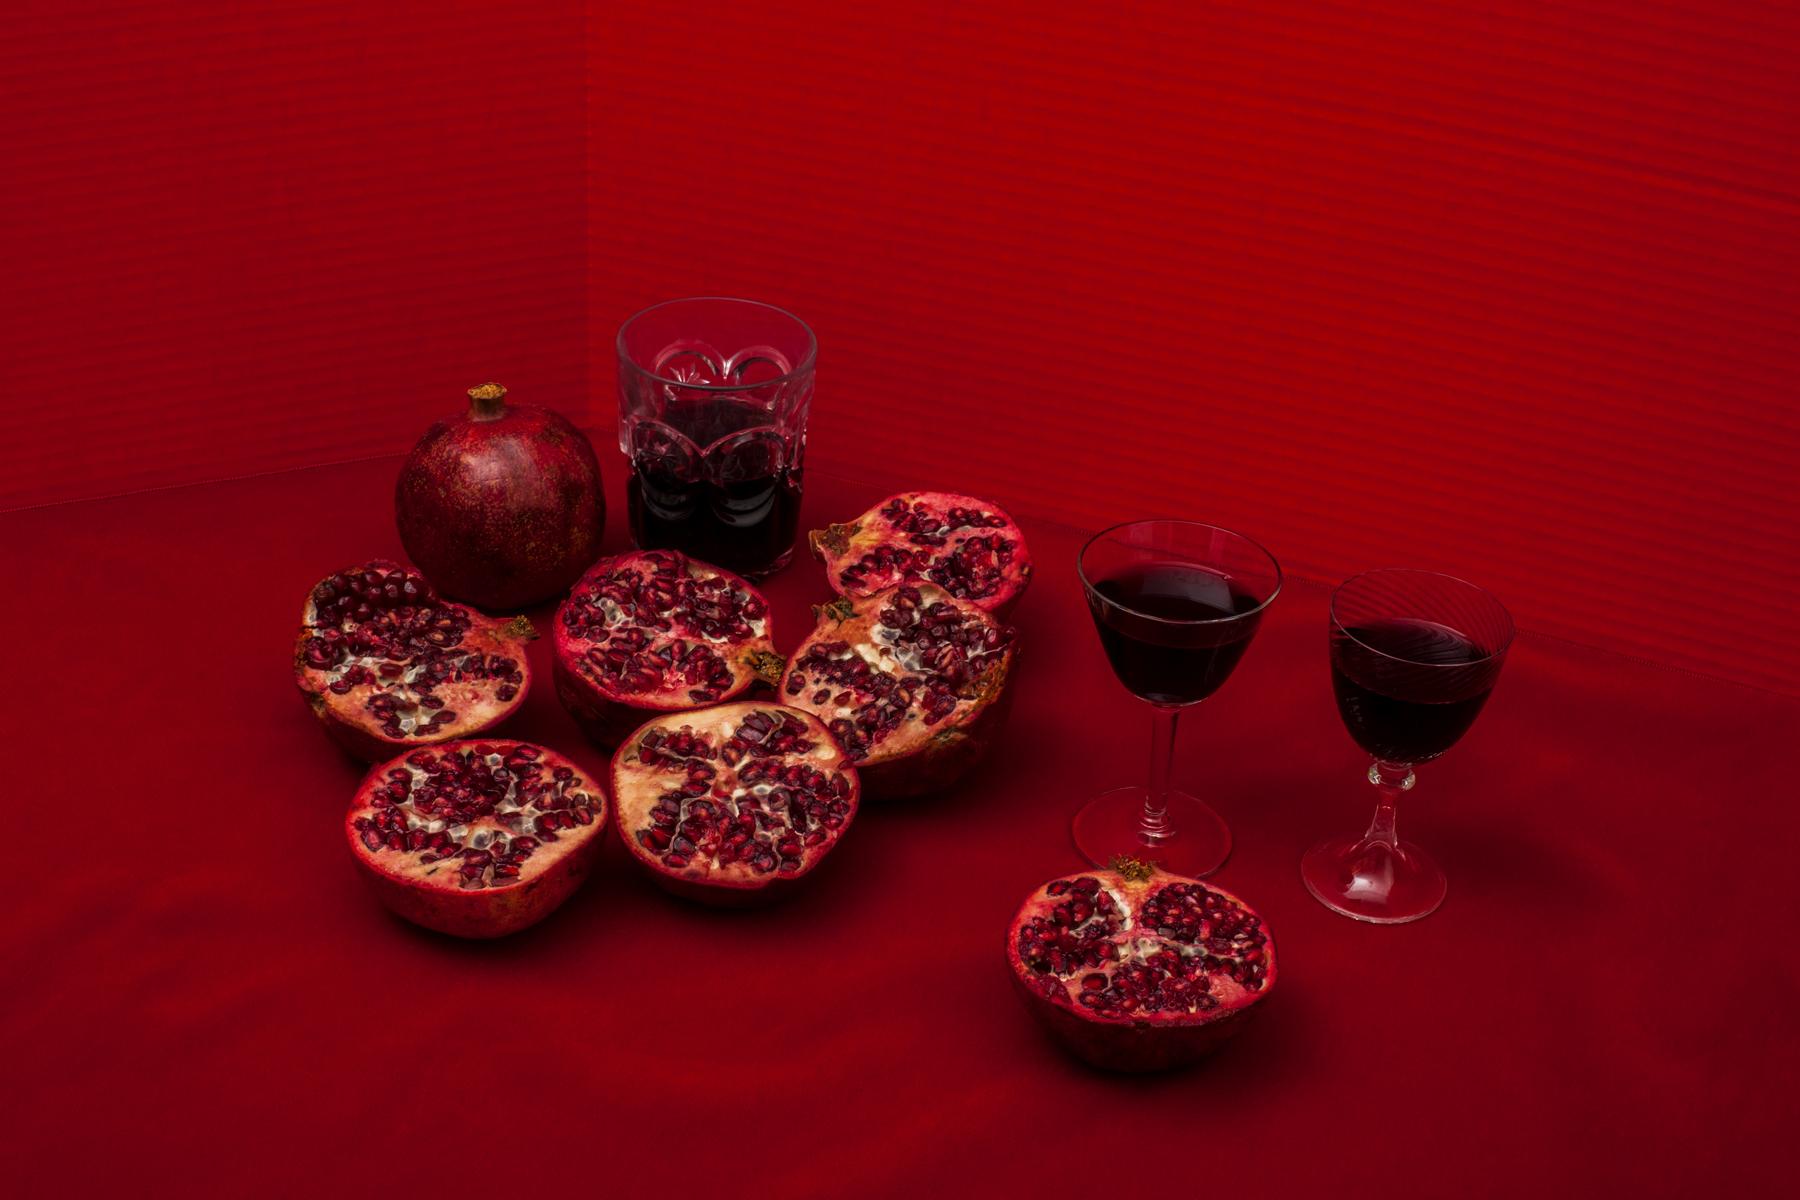 pomegranateonred54.jpg